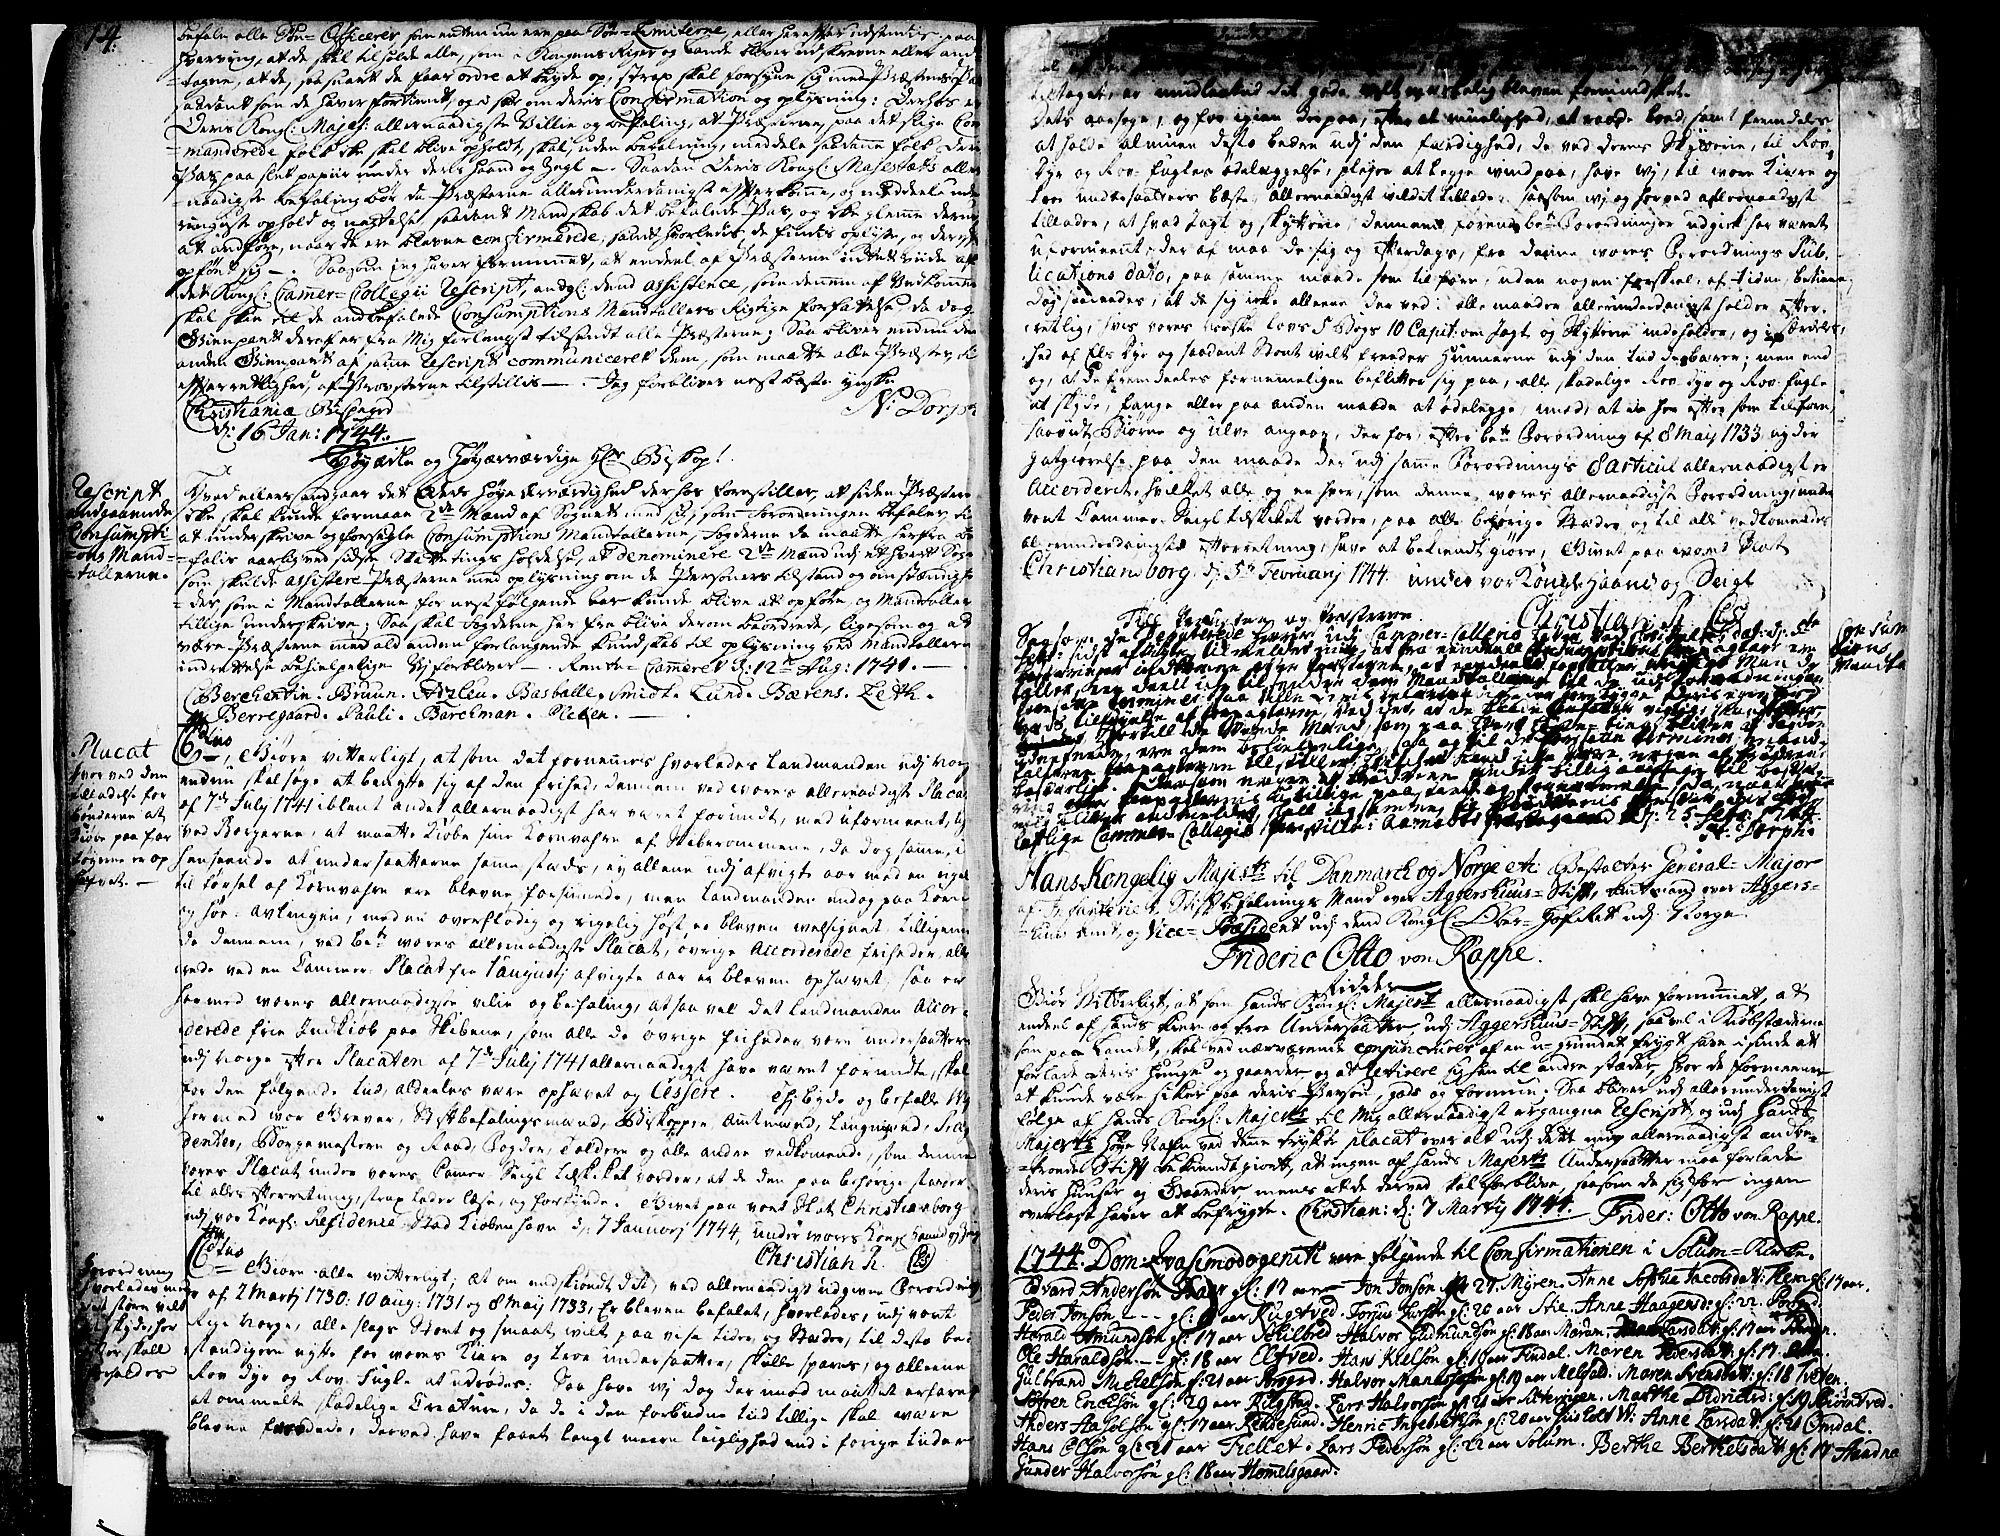 SAKO, Solum sokneprestkontor, A/Aa/L0002: Annen kirkebok nr. 2, 1743-1791, s. 14-15